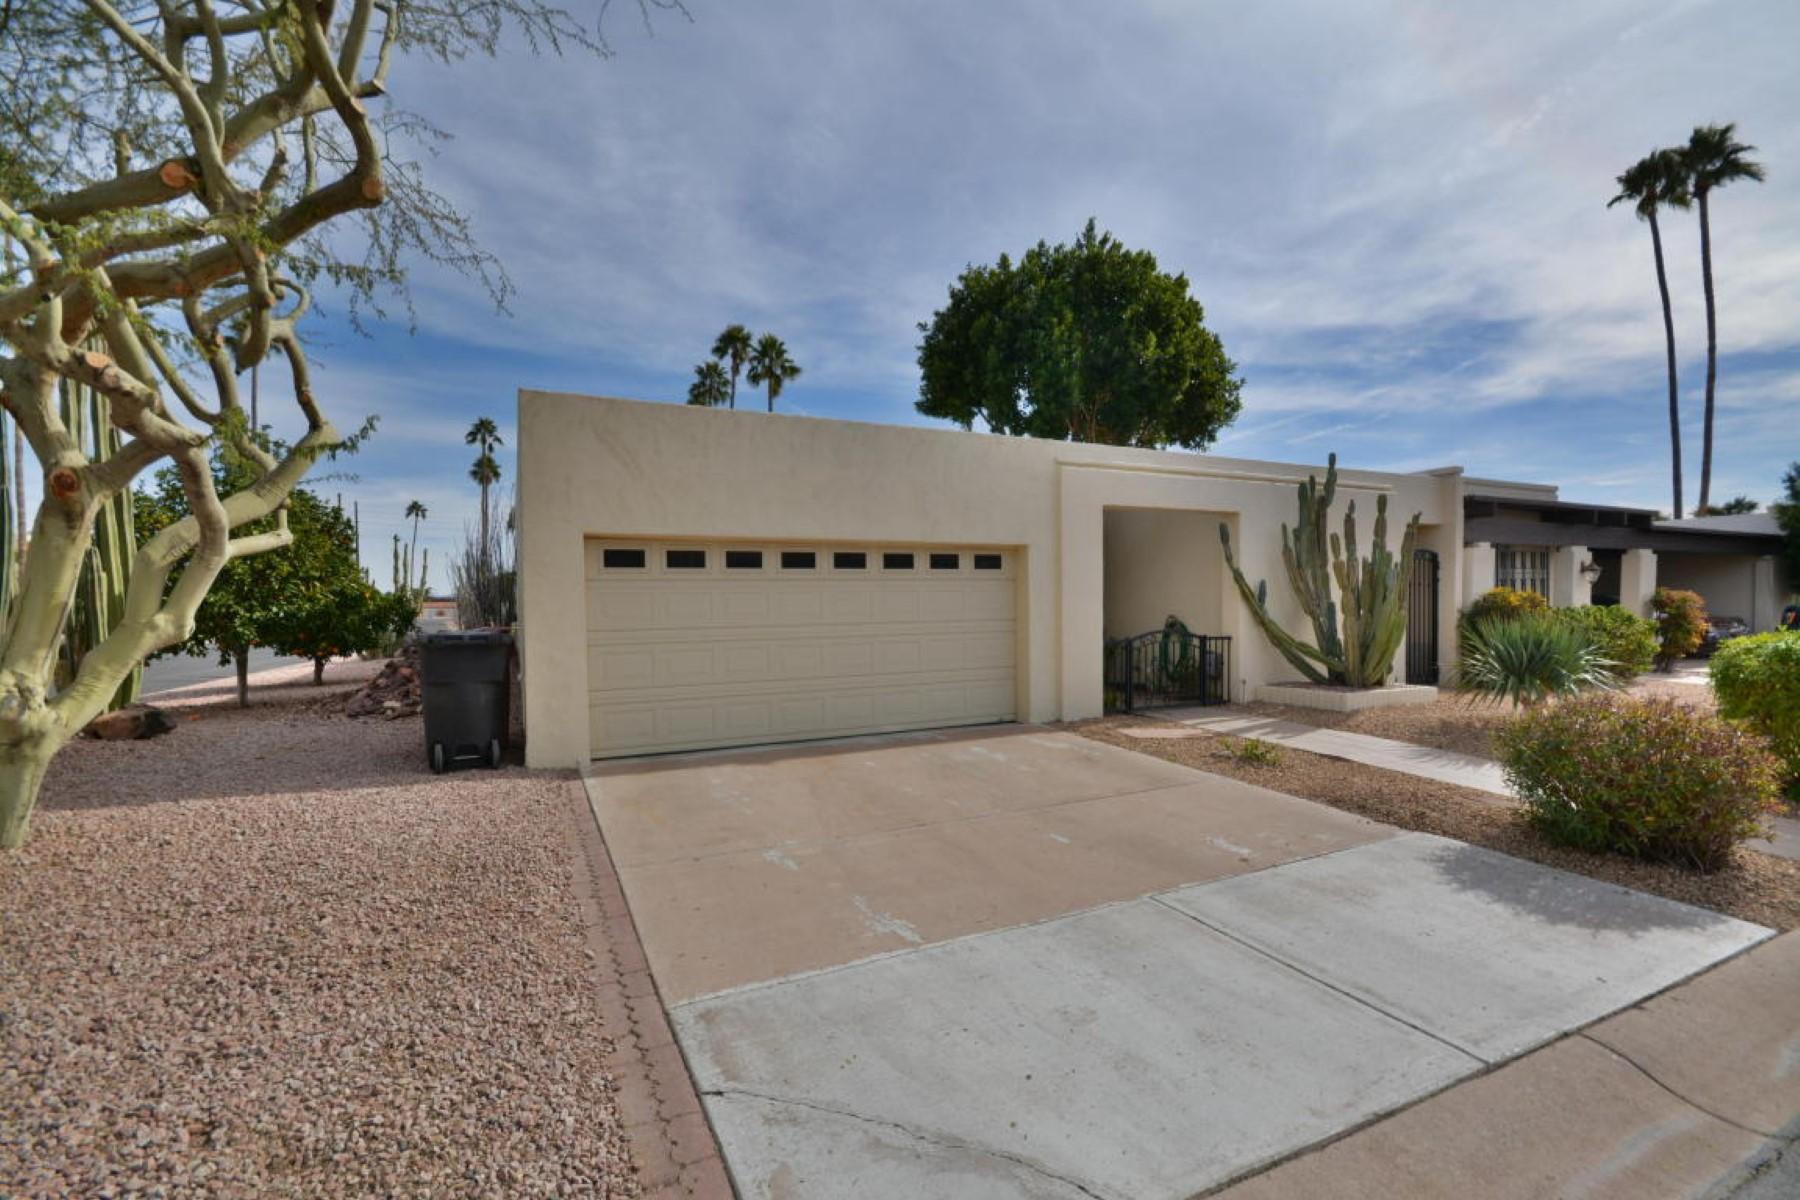 Villetta a schiera per Vendita alle ore Beautifully built townhome by renowned builder ET Wright 4123 N 87th Way Scottsdale, Arizona 85251 Stati Uniti